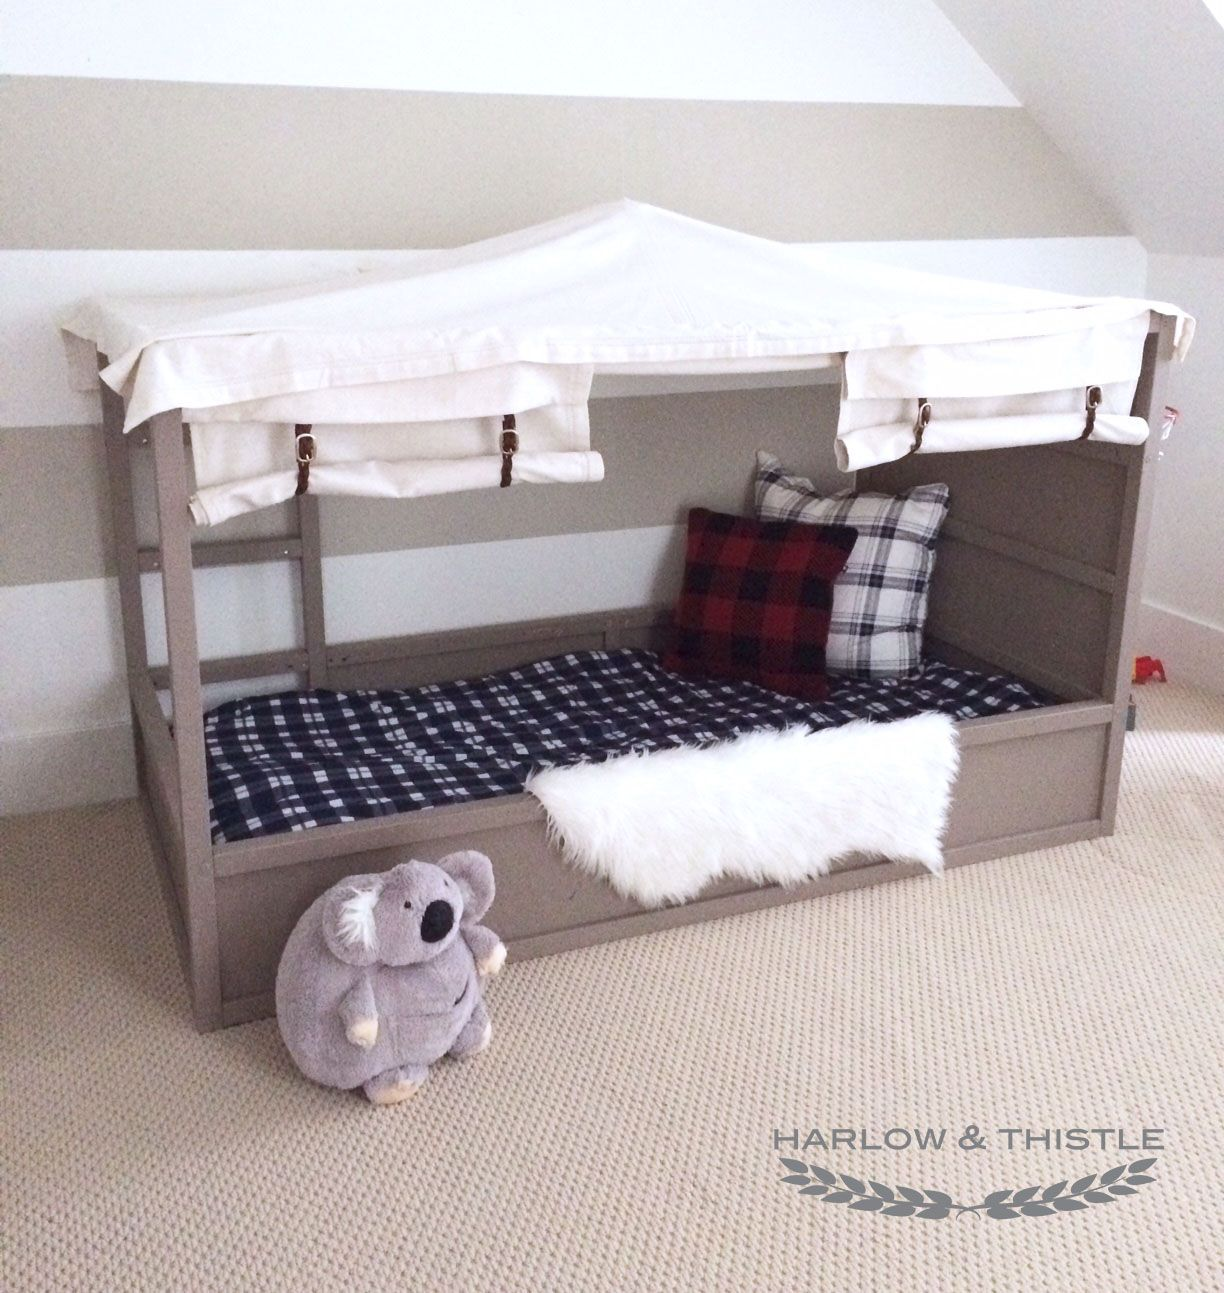 Harlow Thistle Home Design Lifestyle Diy Ikea Kura Bed Hack Diy Boy Canopy Bed Ikea Kura Bed Kura Bed Ikea Kura